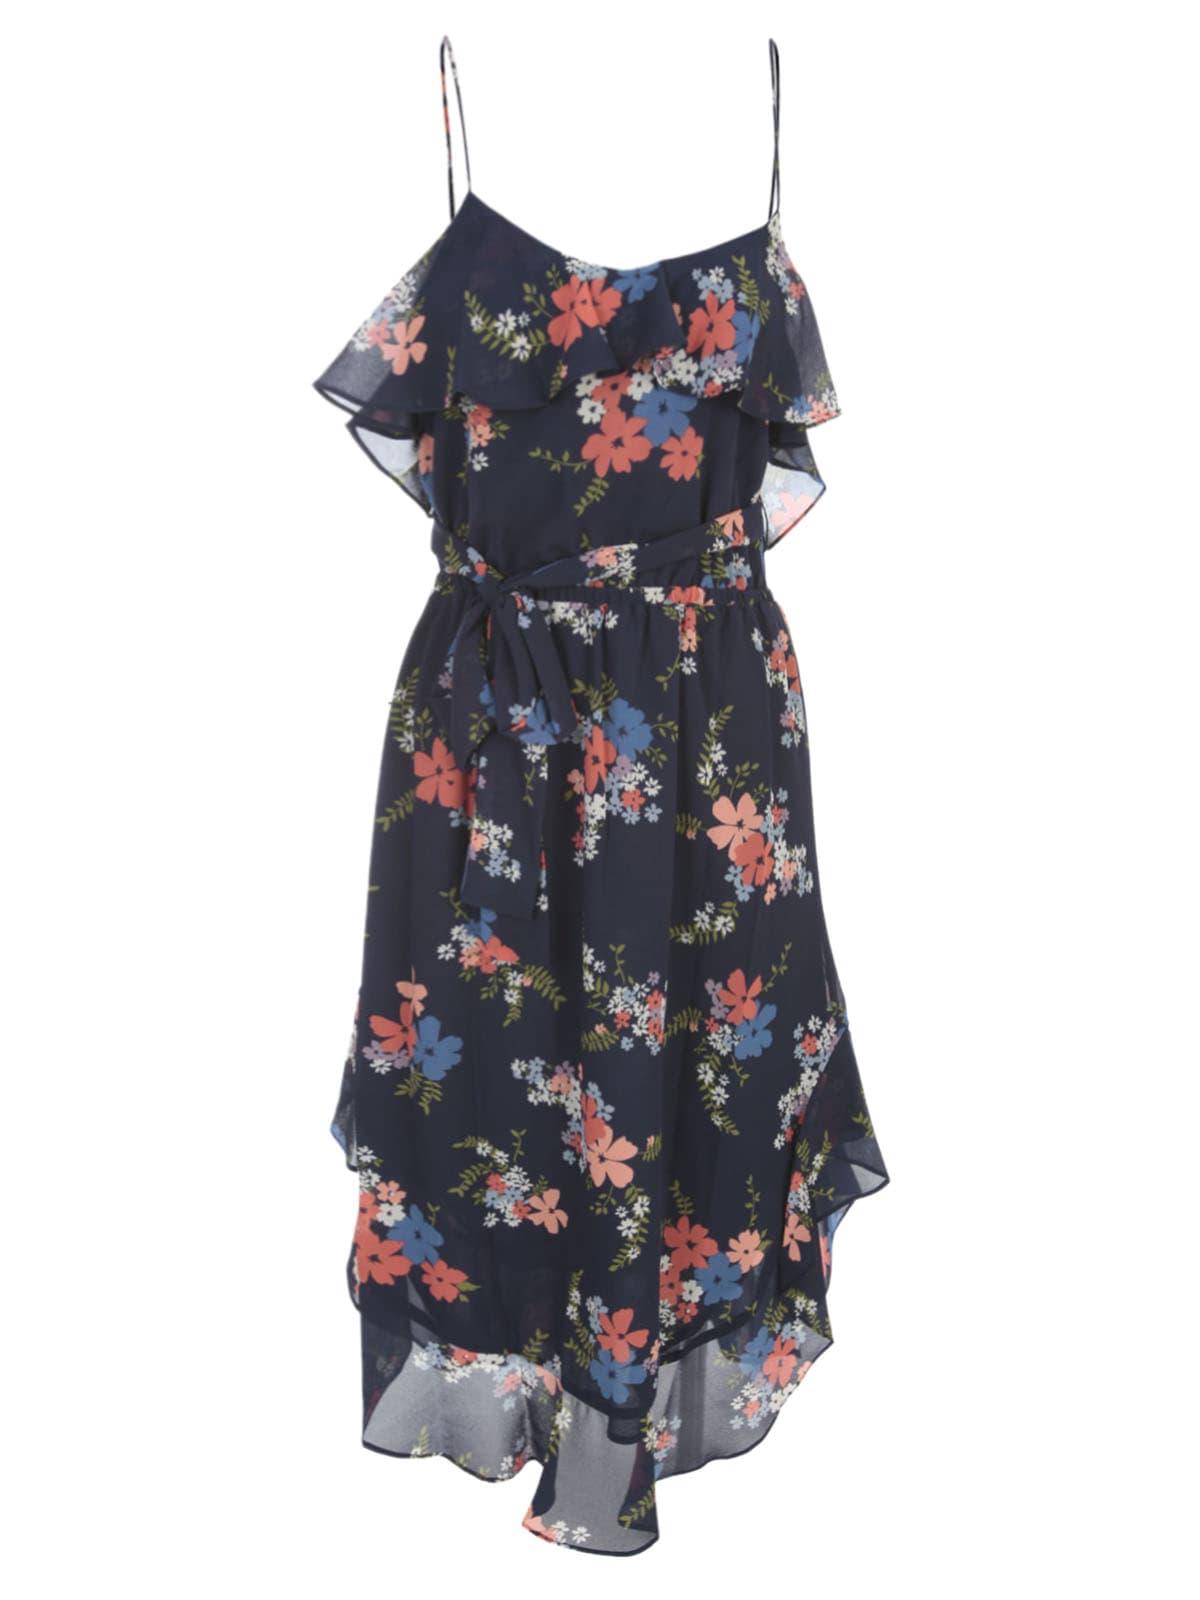 Buy MICHAEL Michael Kors Blmg Bqt Flounce Dress online, shop MICHAEL Michael Kors with free shipping